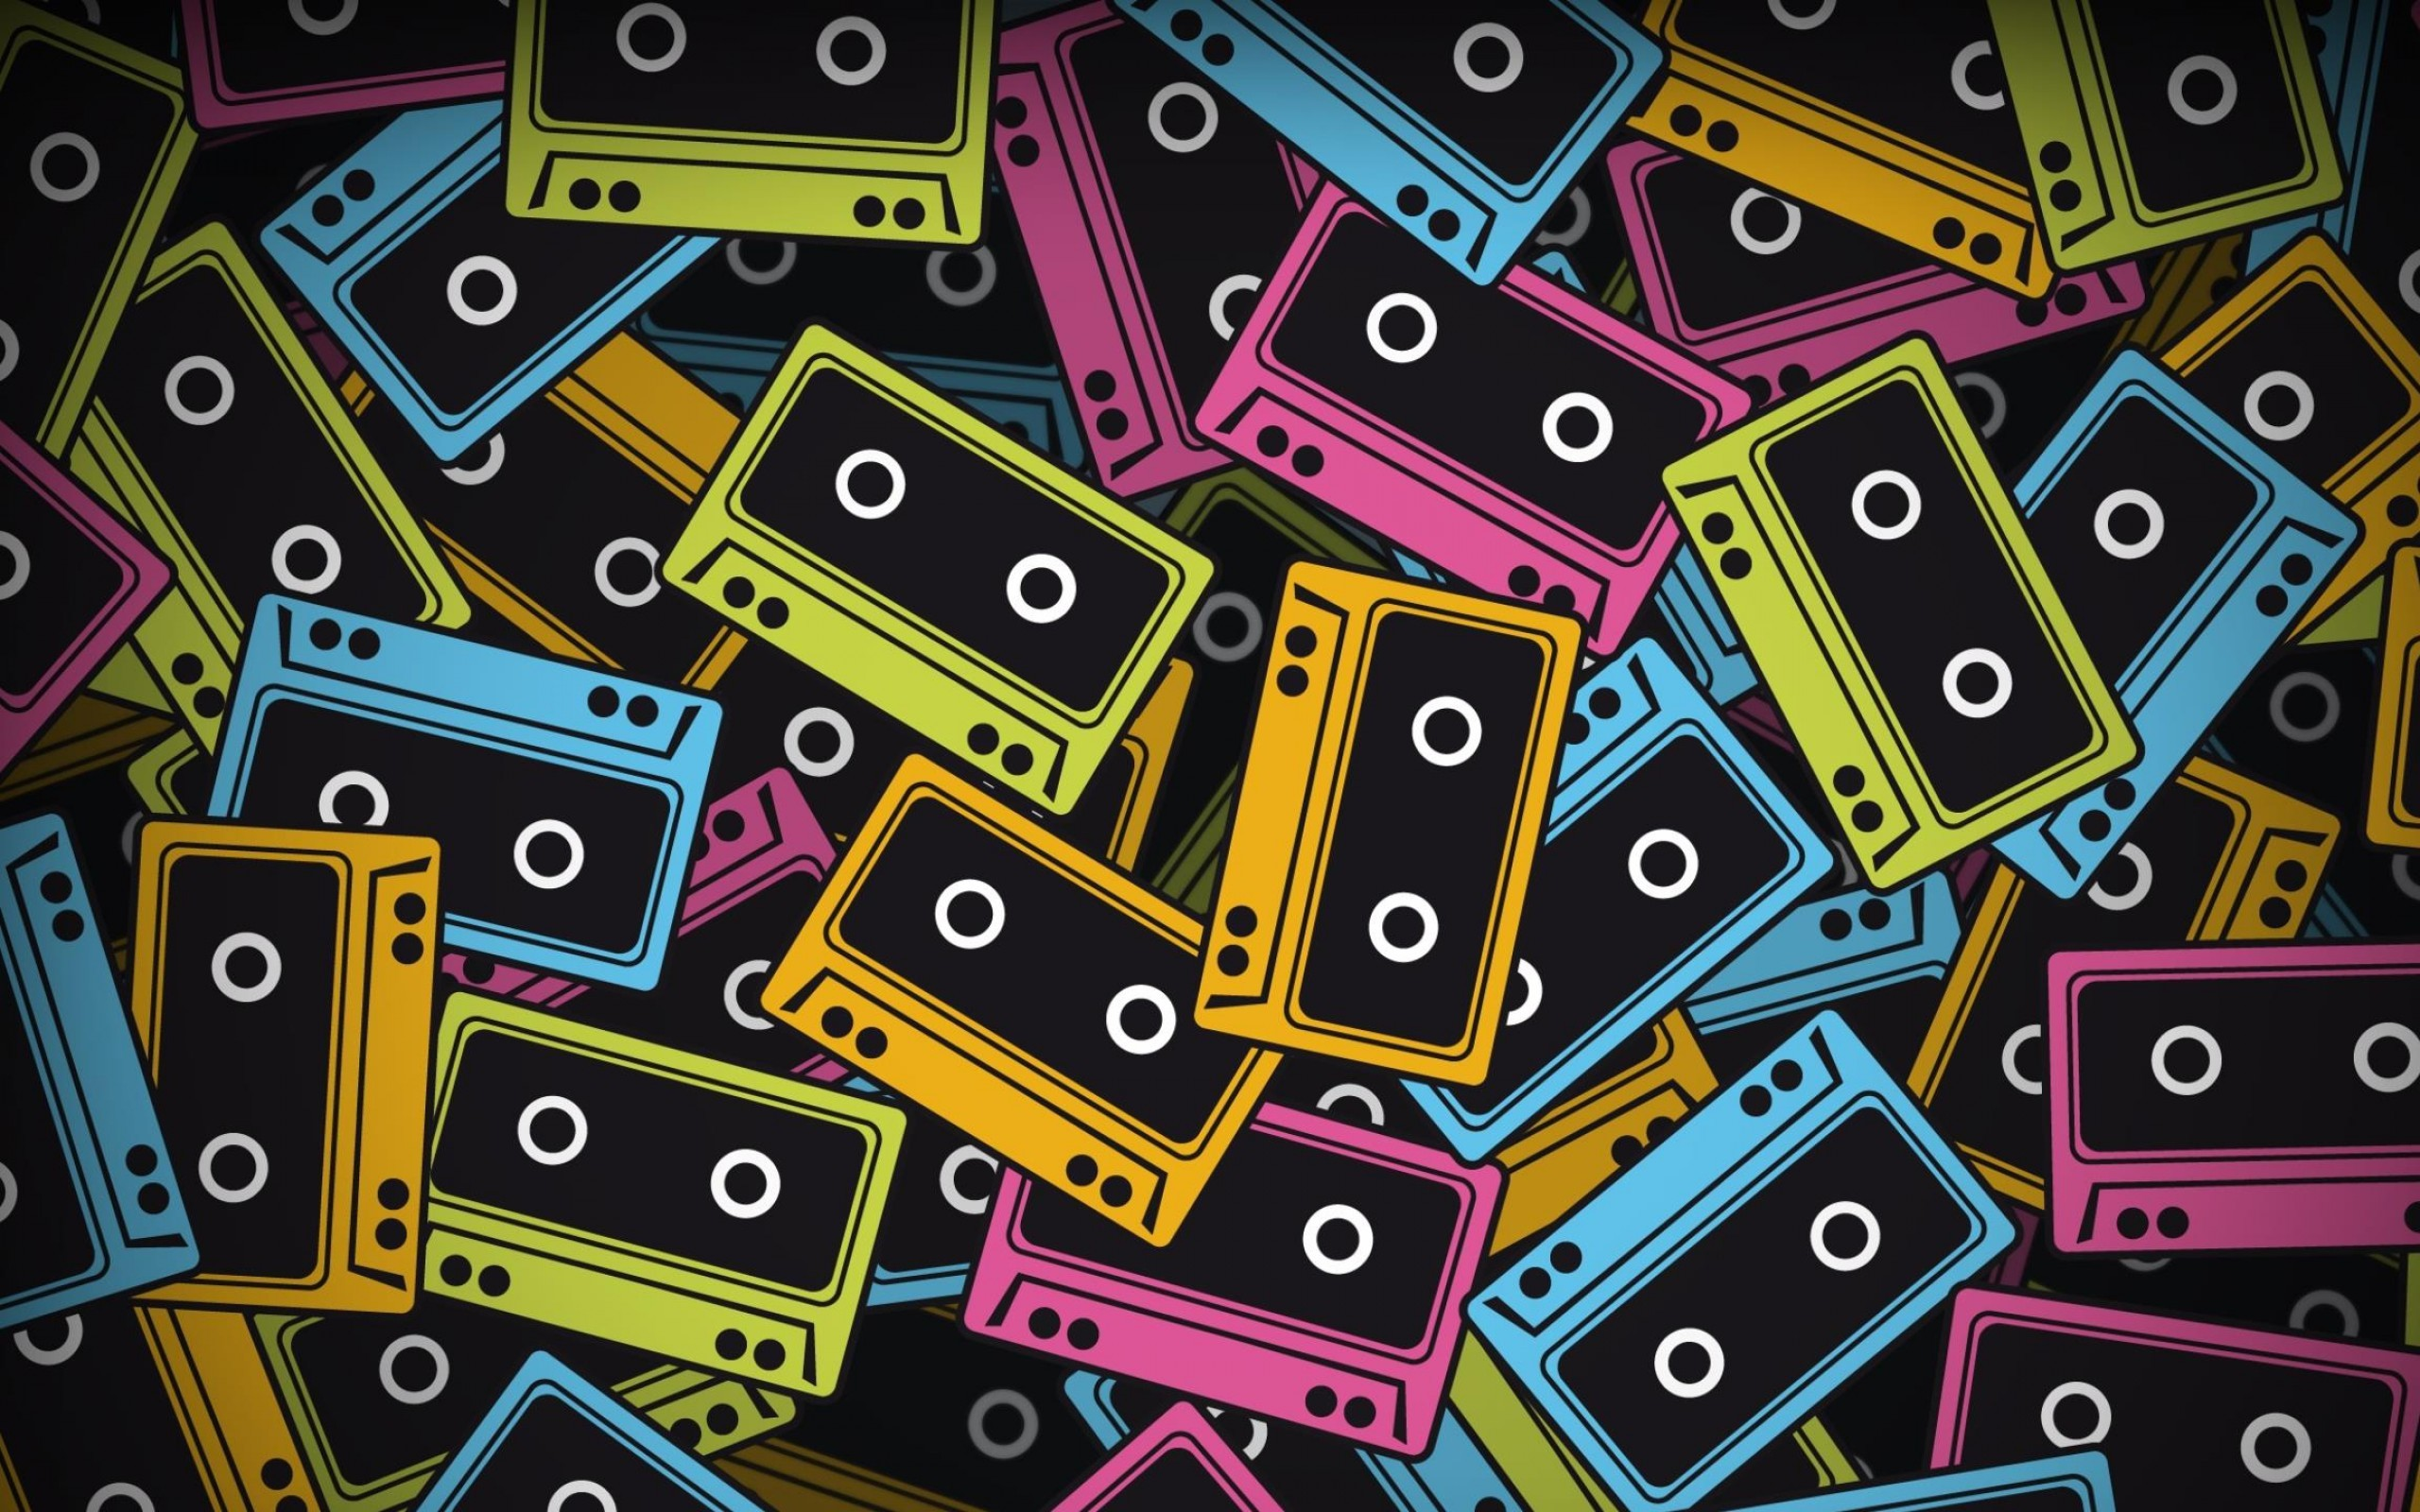 Download 80s Music Wallpaper Gallery